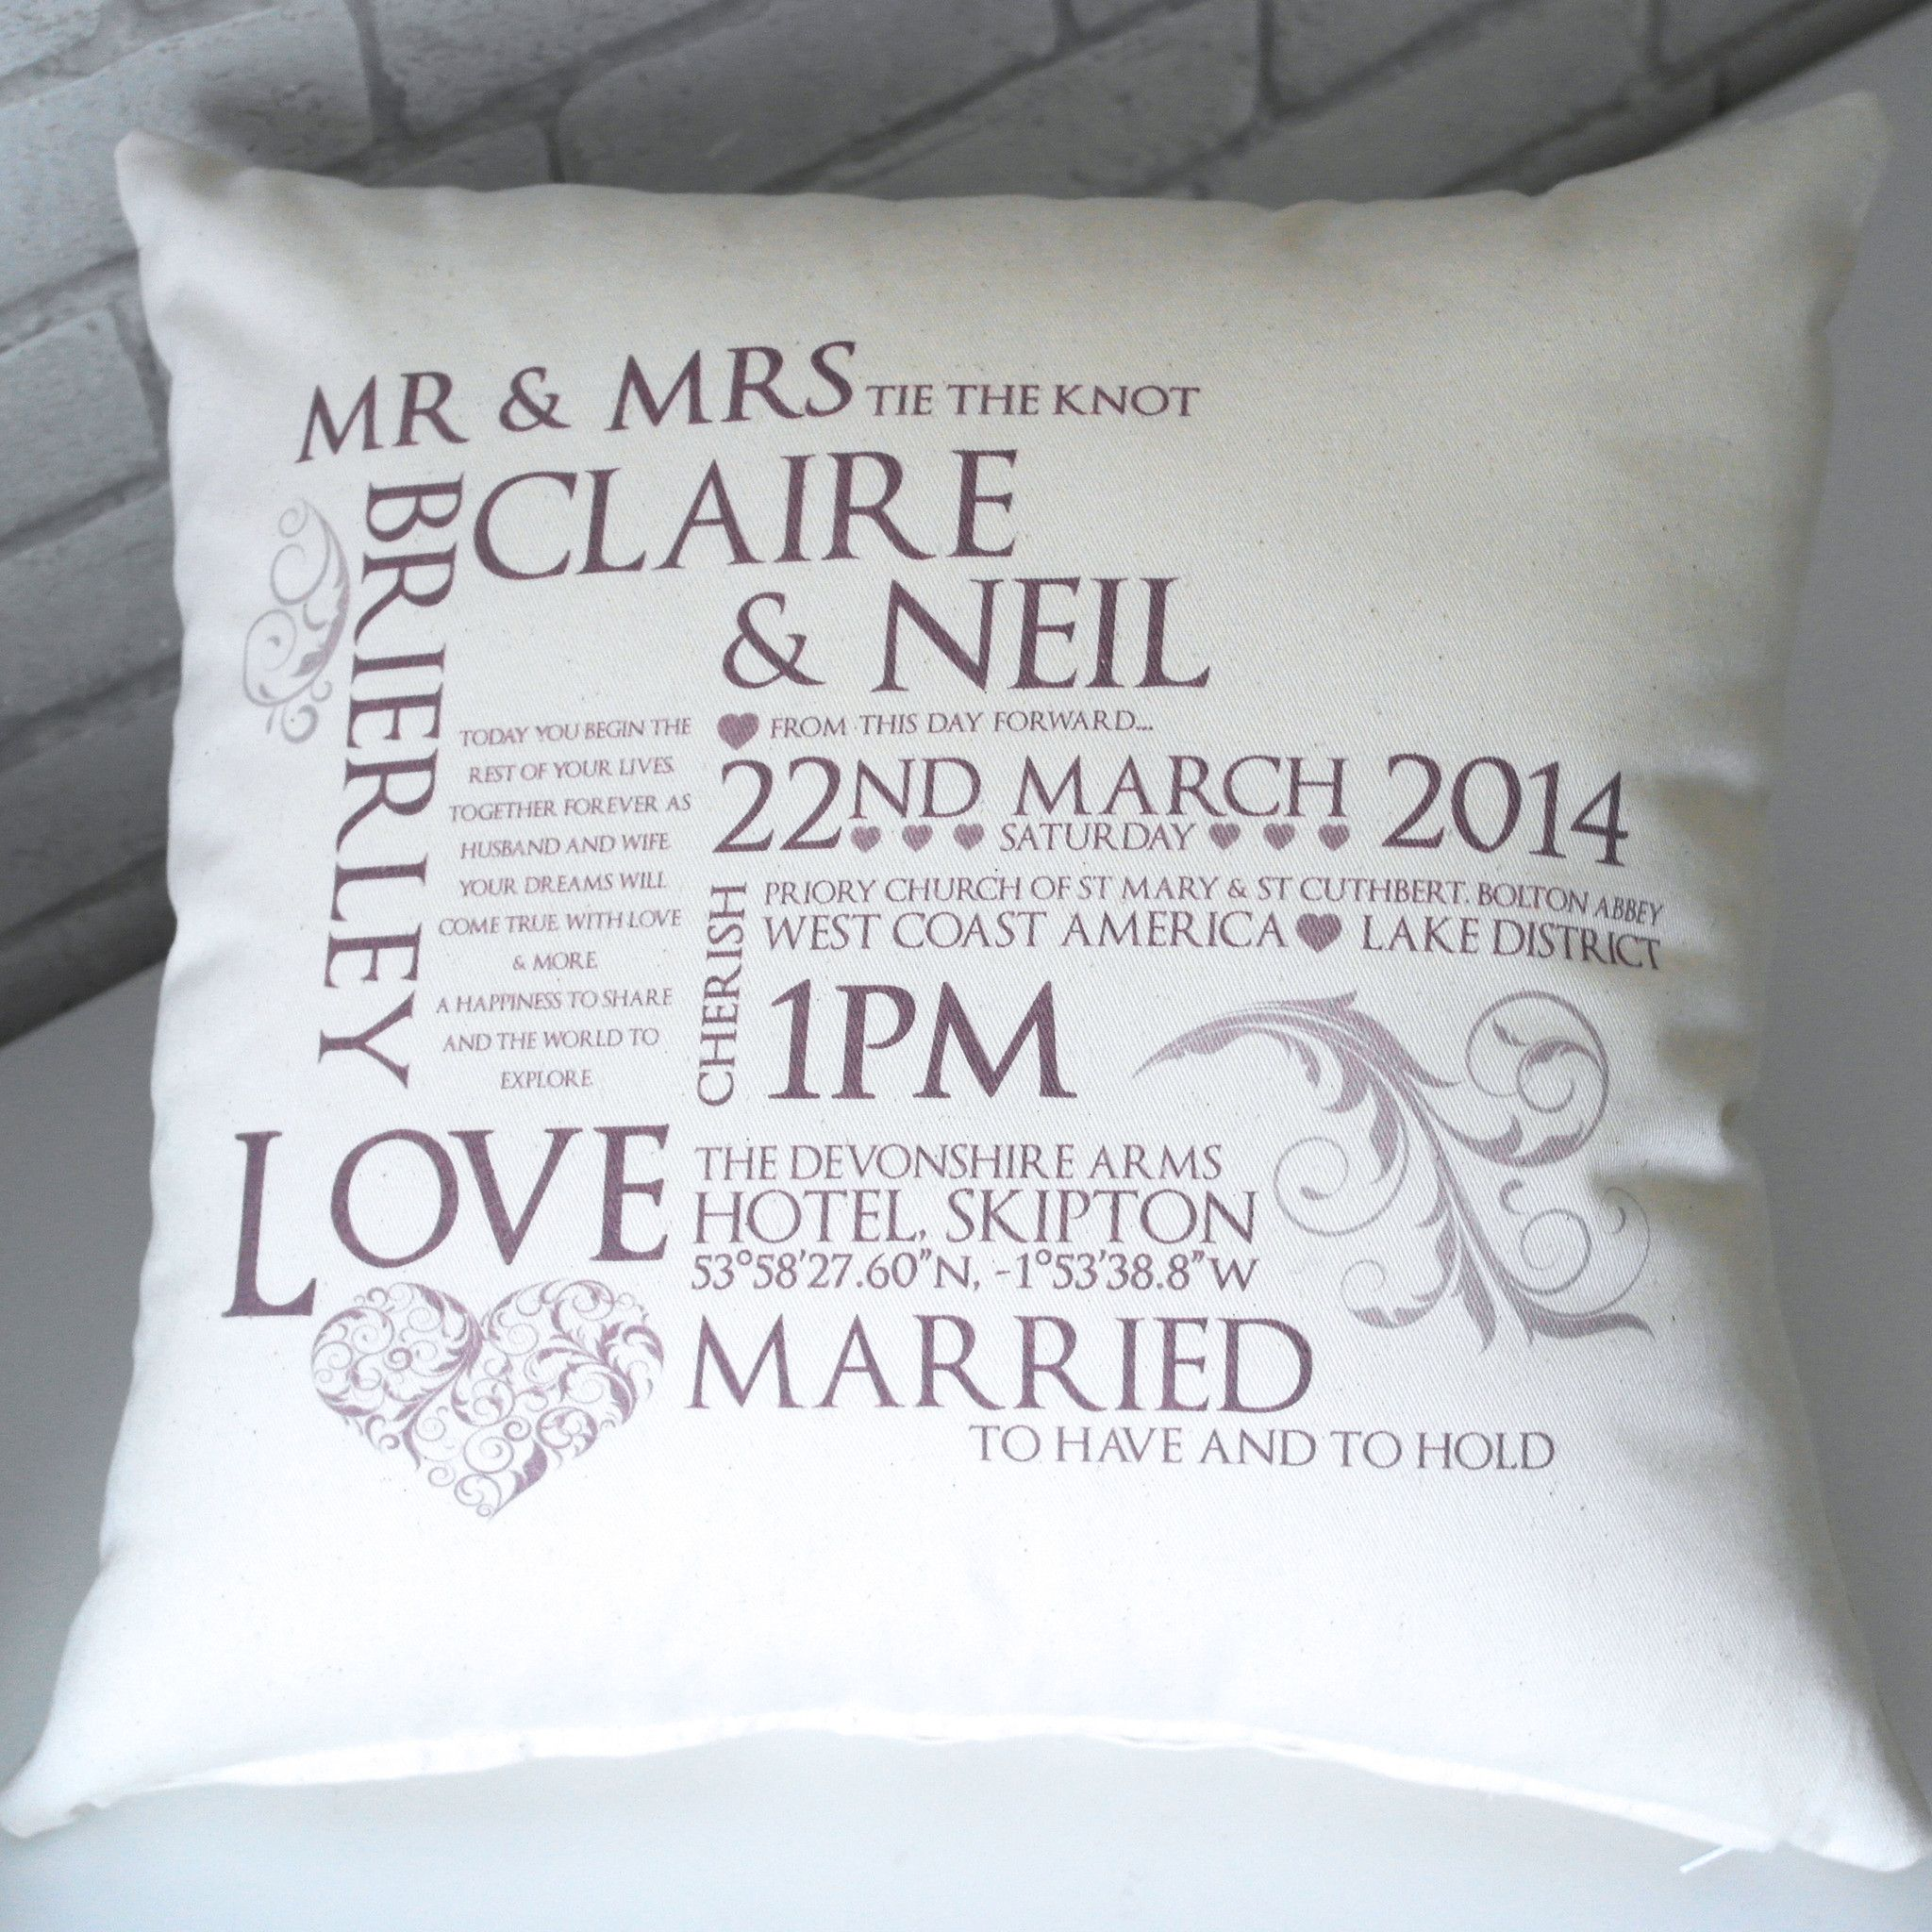 Wedding Keepsake Cushion - All Things Interior - 6 | Gifts and ...